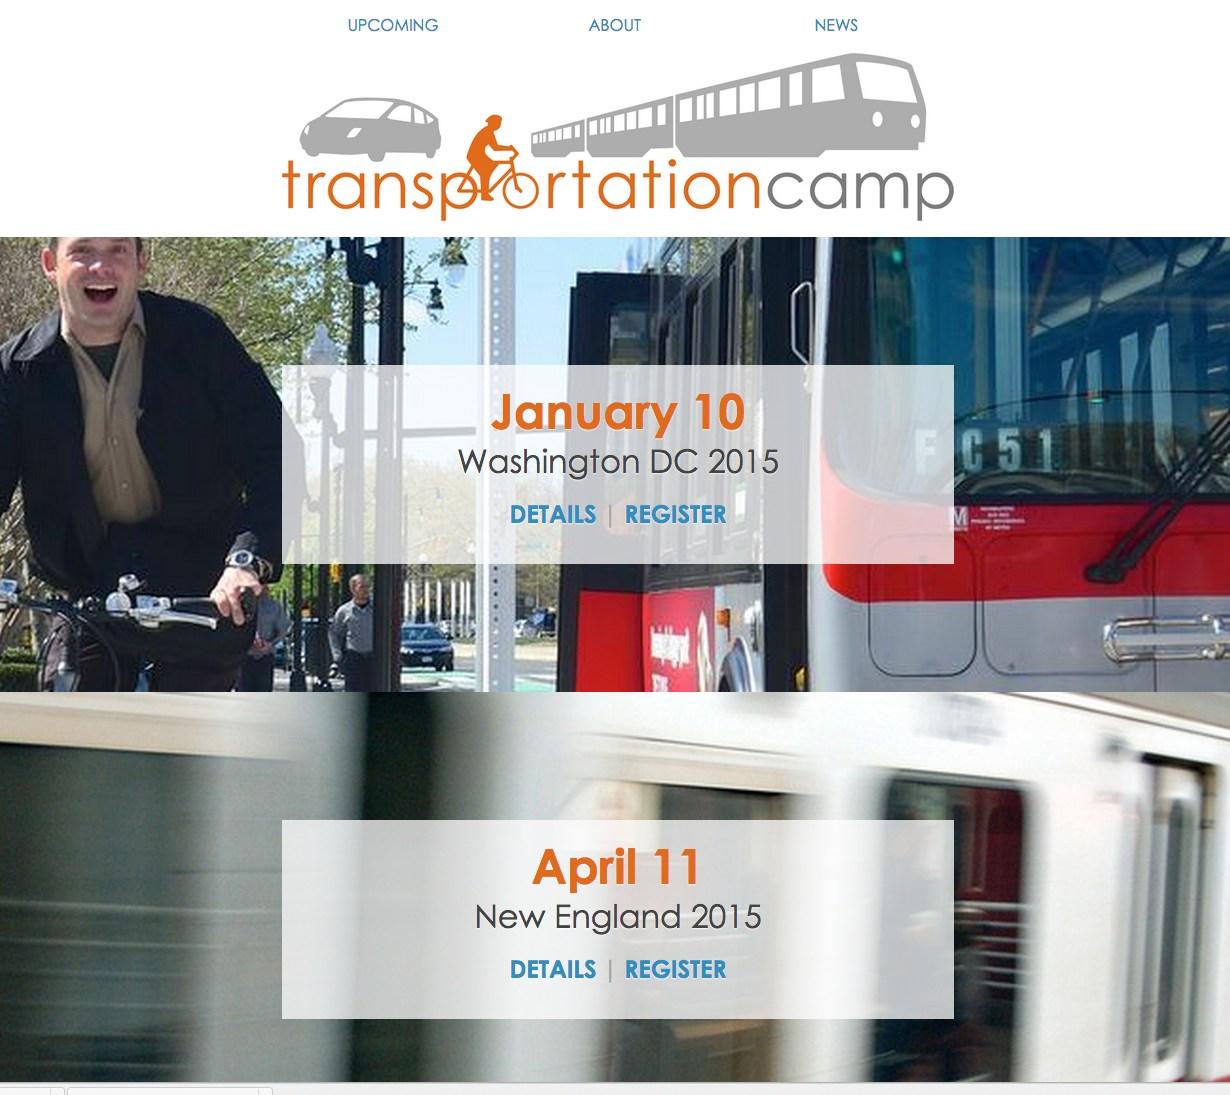 Transportation Camp website screenshot - November 2014